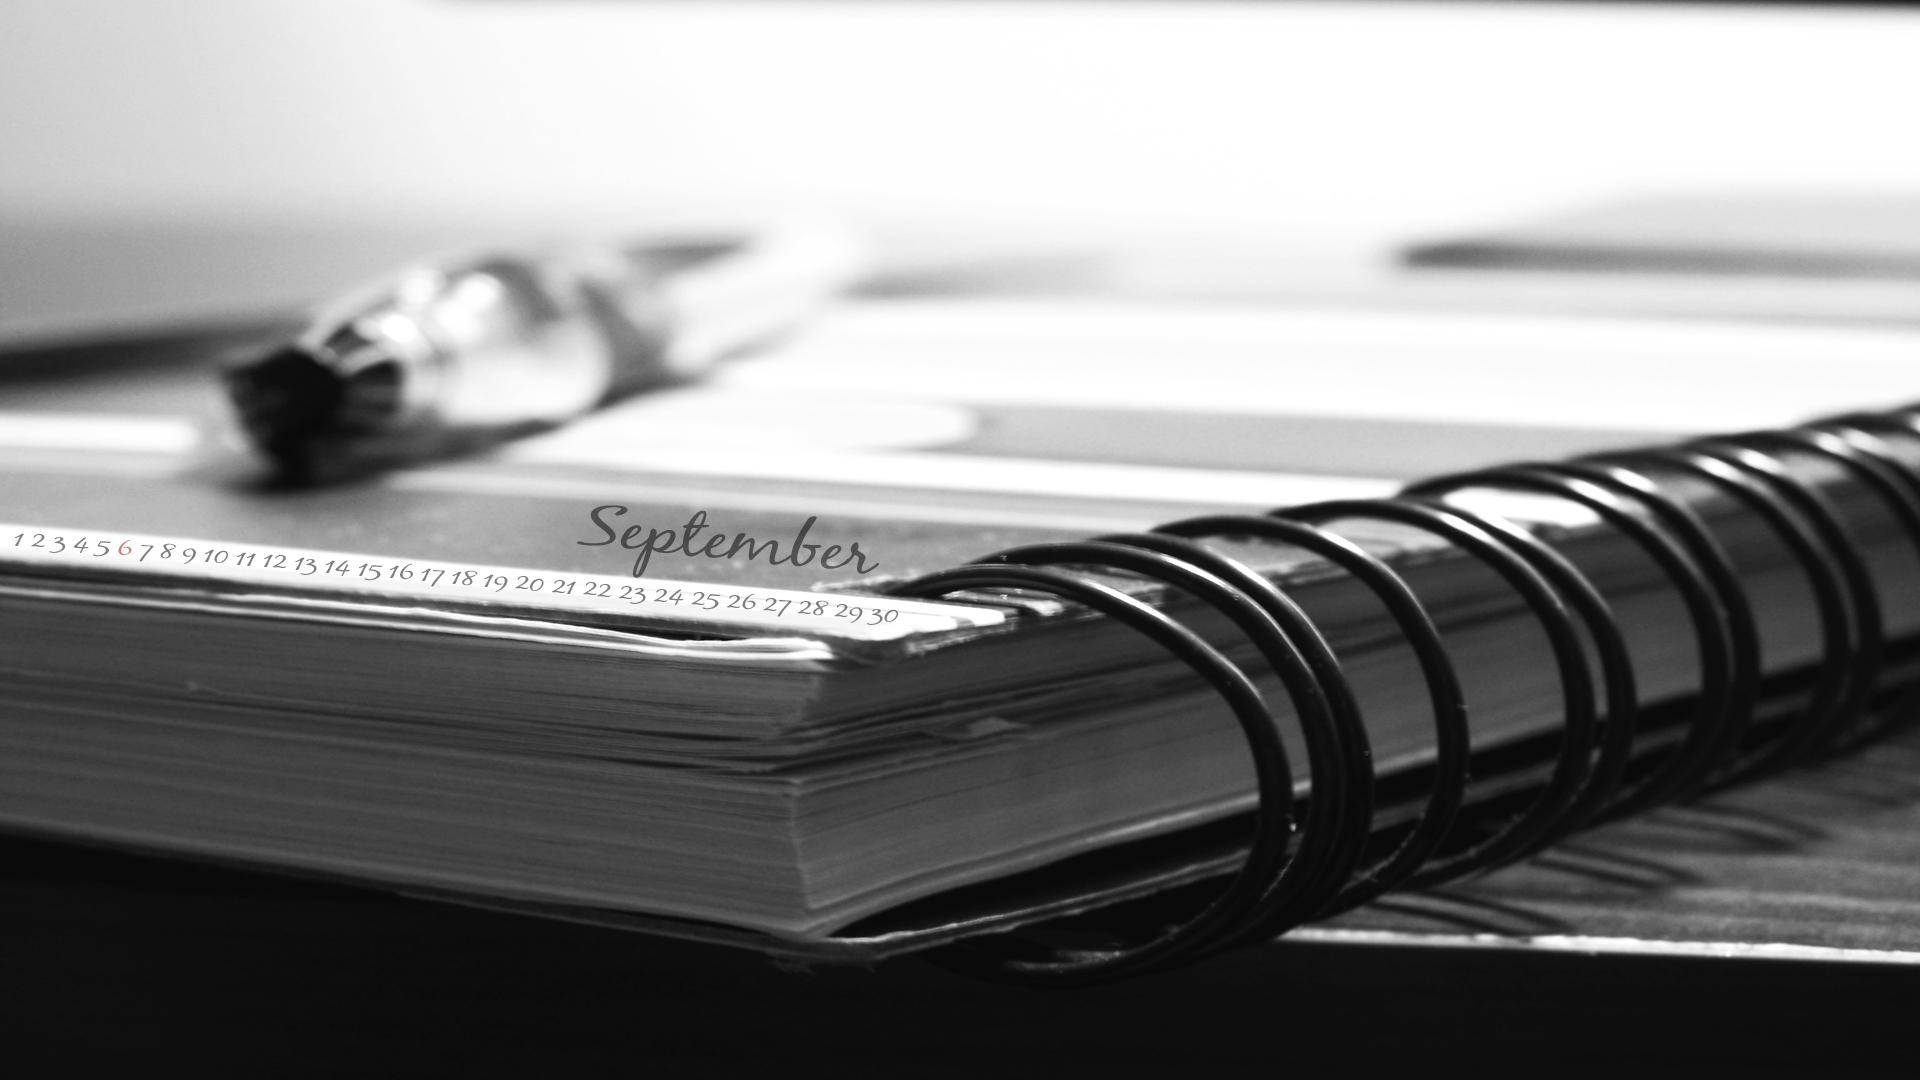 September calender_ Note book